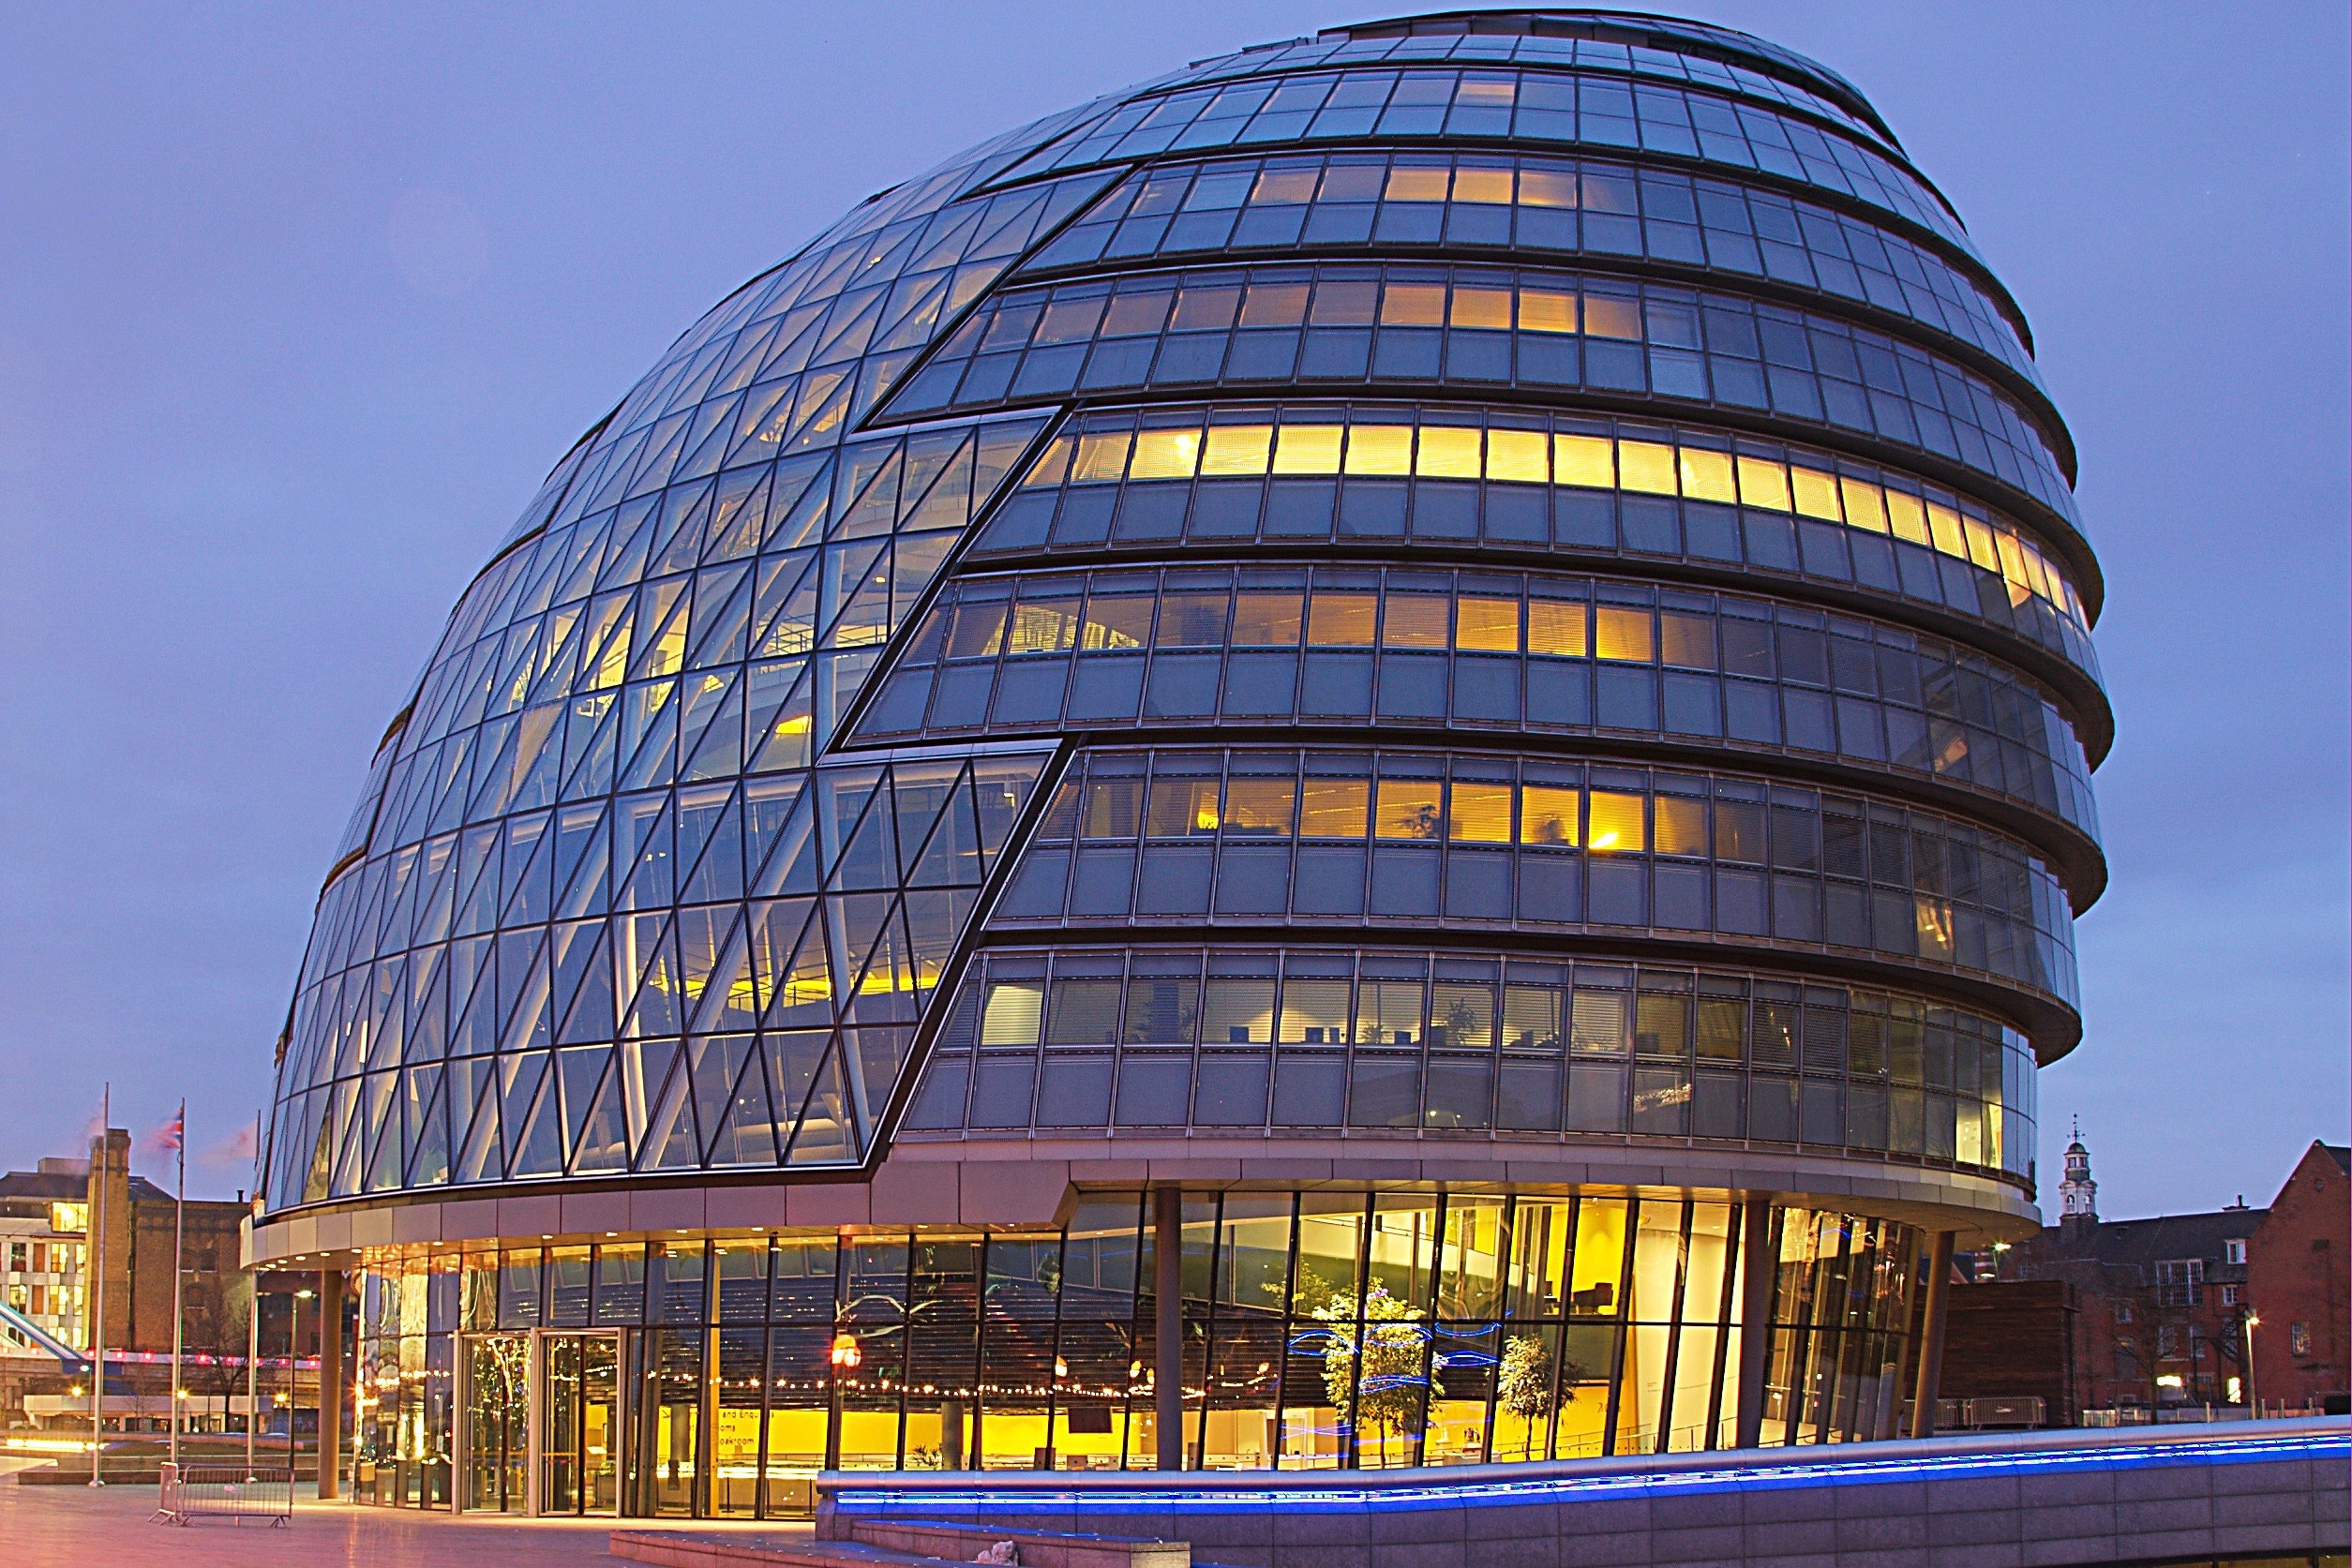 City Hall London at dawn. Photo Wikipedia